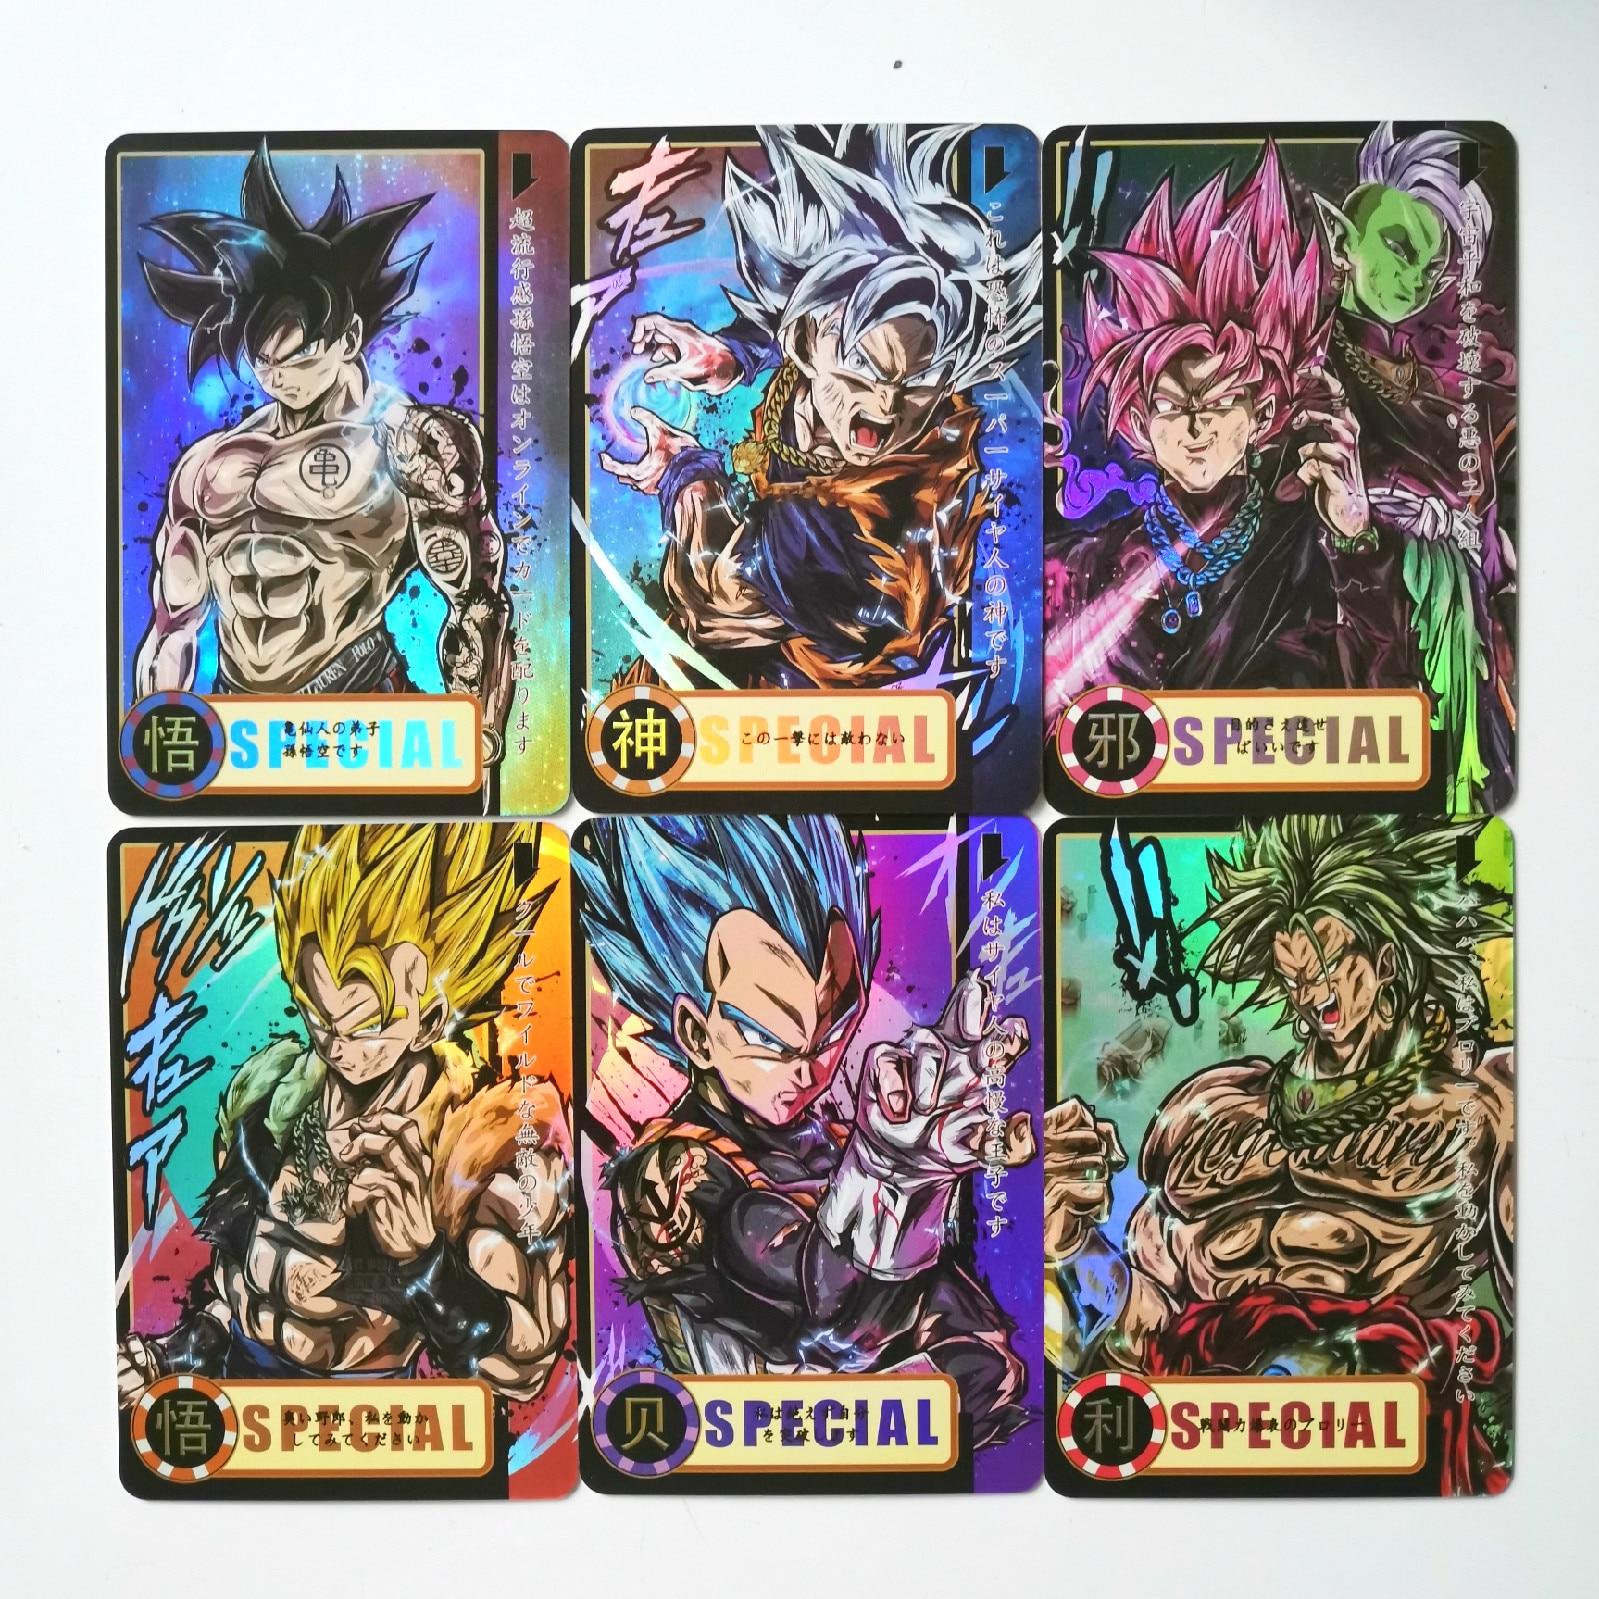 13pcs/set Super Dragon Ball Z Heroes Battle Card Ultra Instinct Goku Vegeta Game Collection Cards